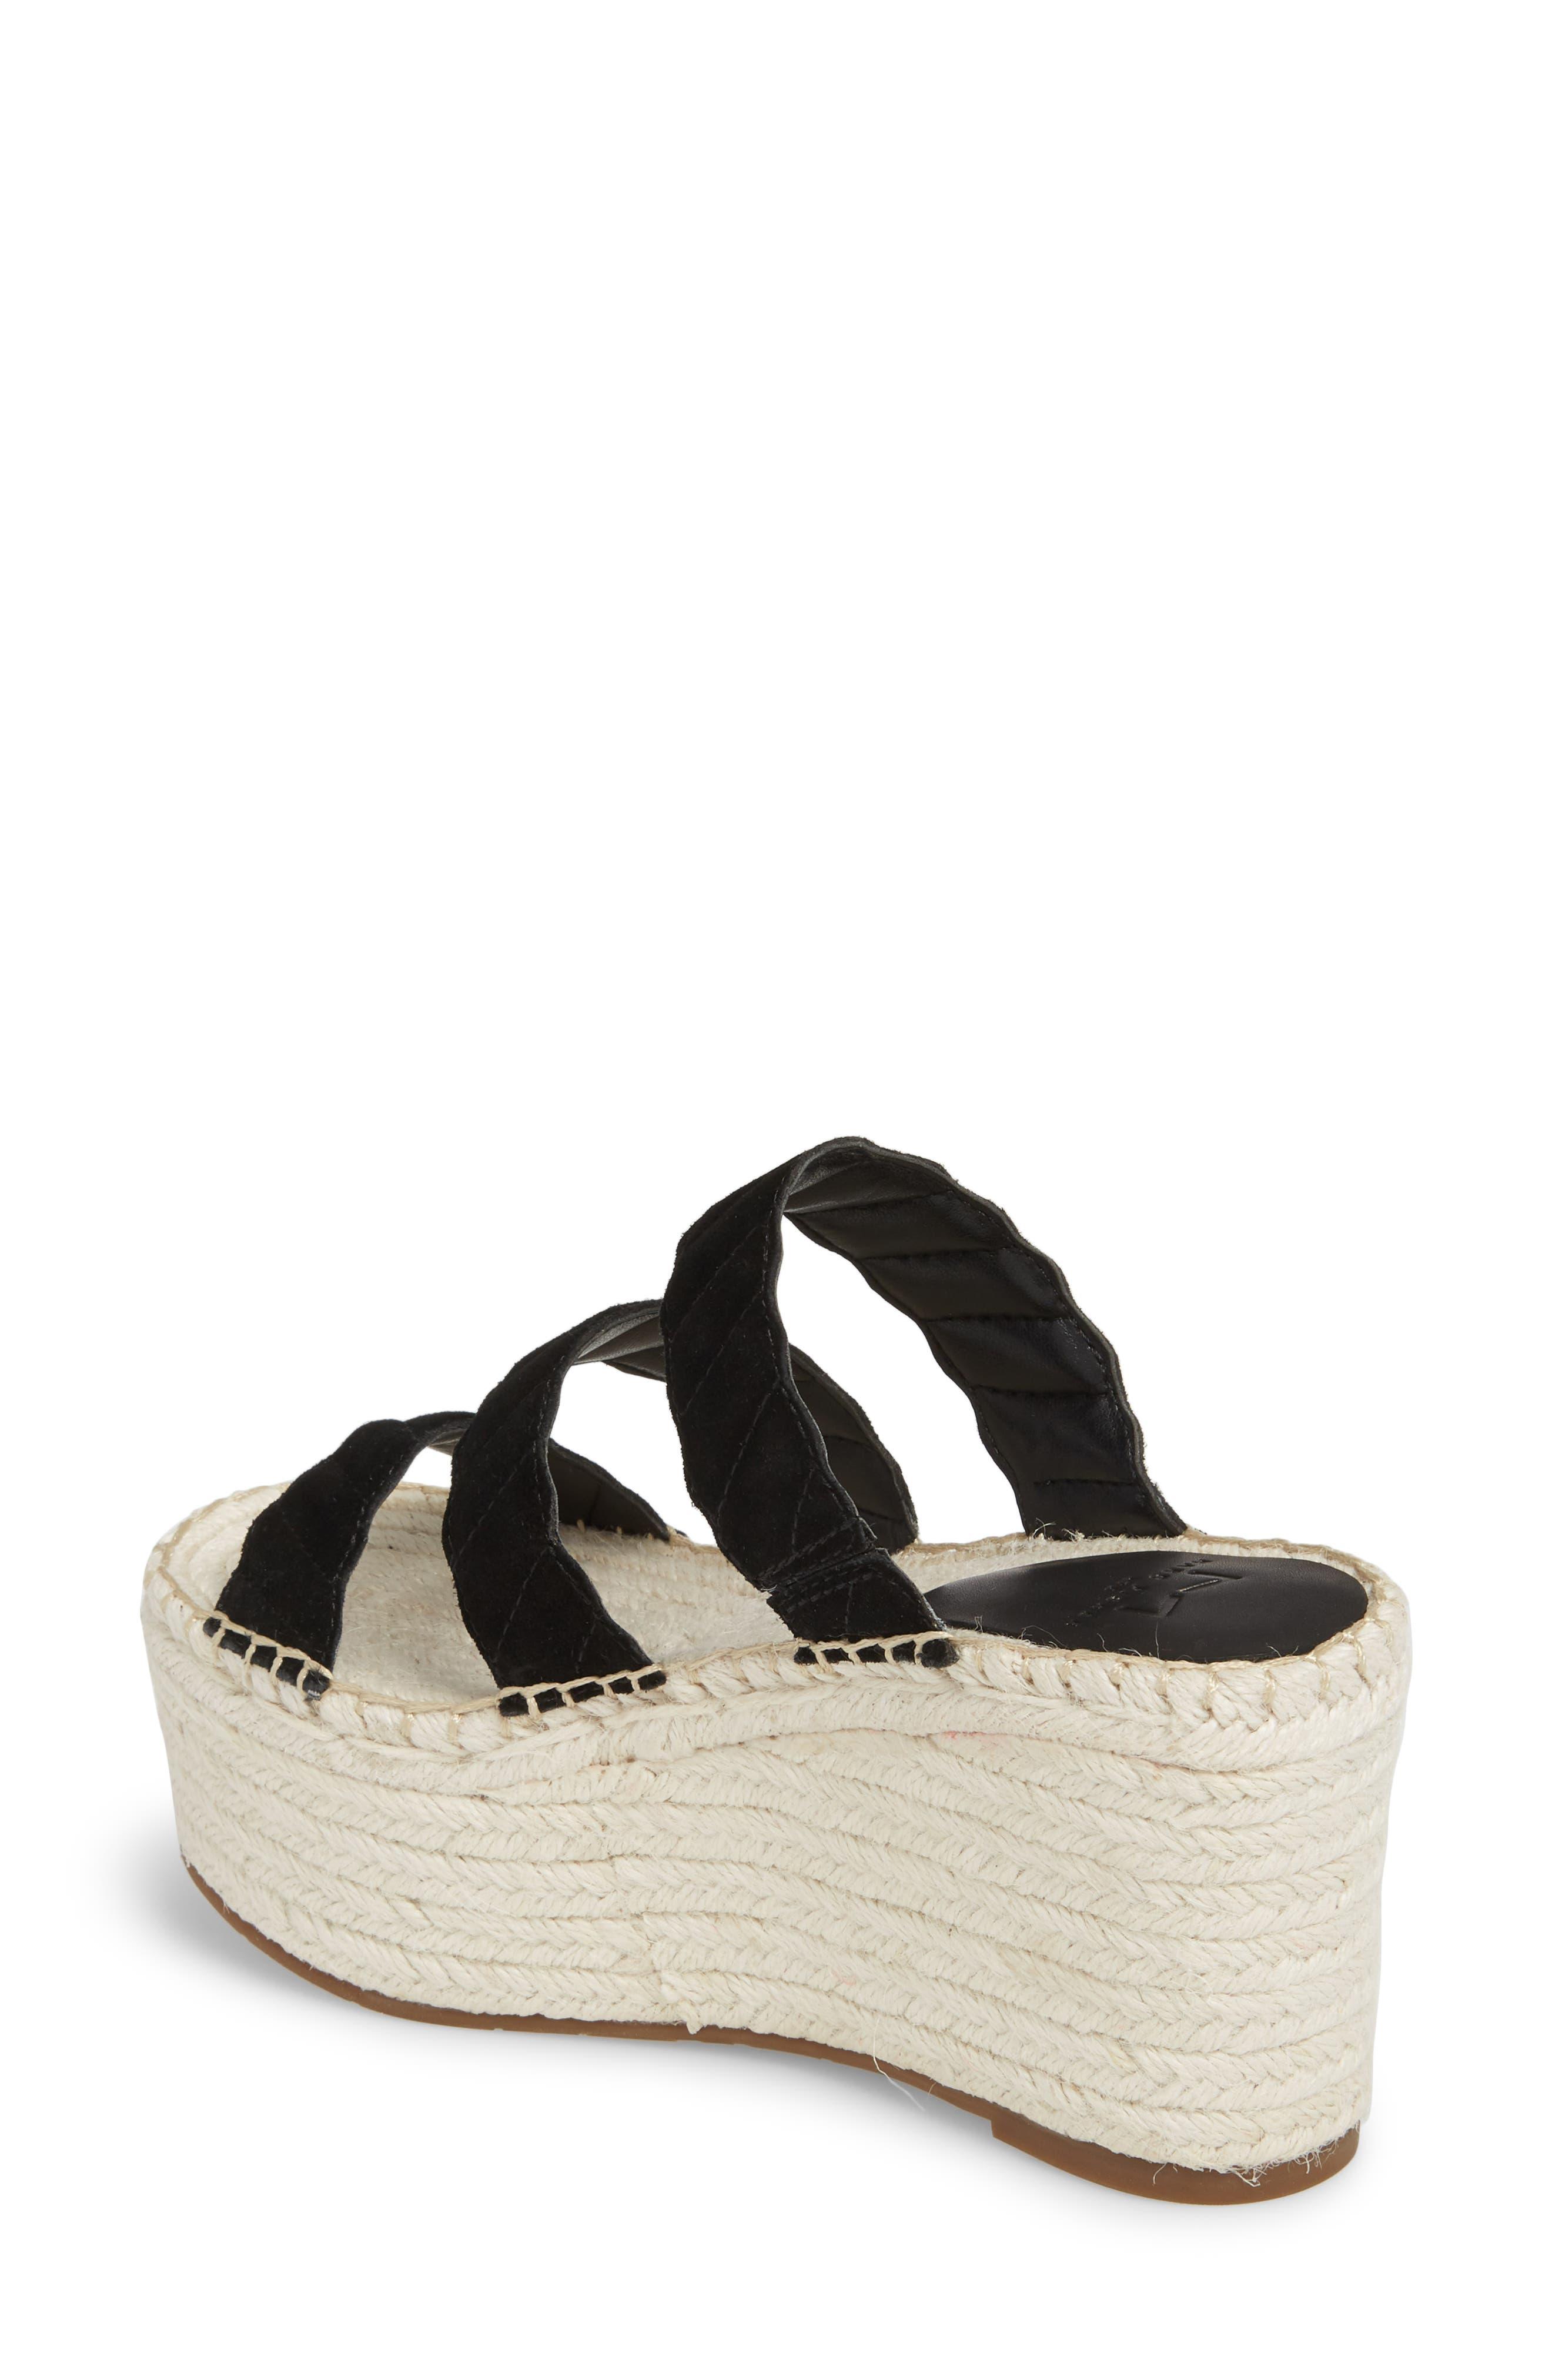 Rosie Espadrille Platform Sandal,                             Alternate thumbnail 2, color,                             BLACK SUEDE